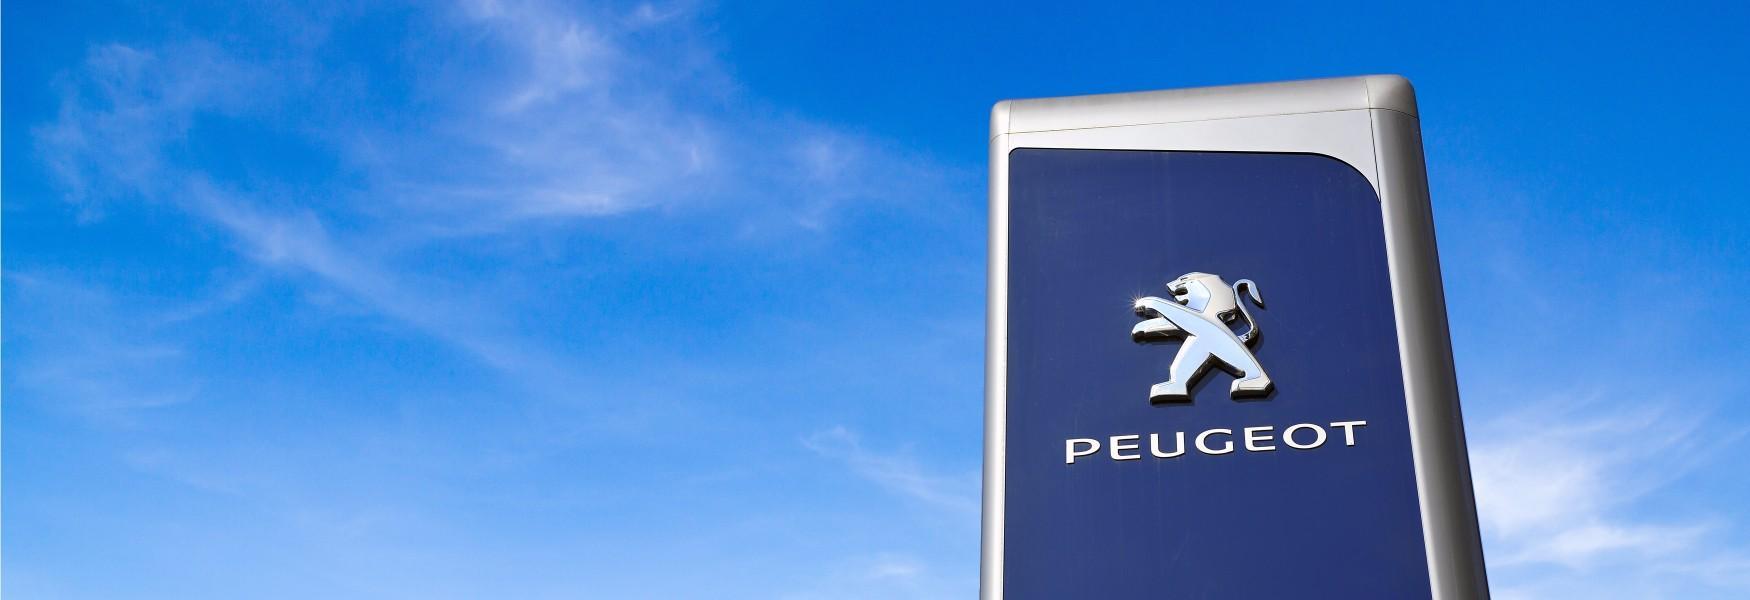 Hersteller Neuwagen Peugeot